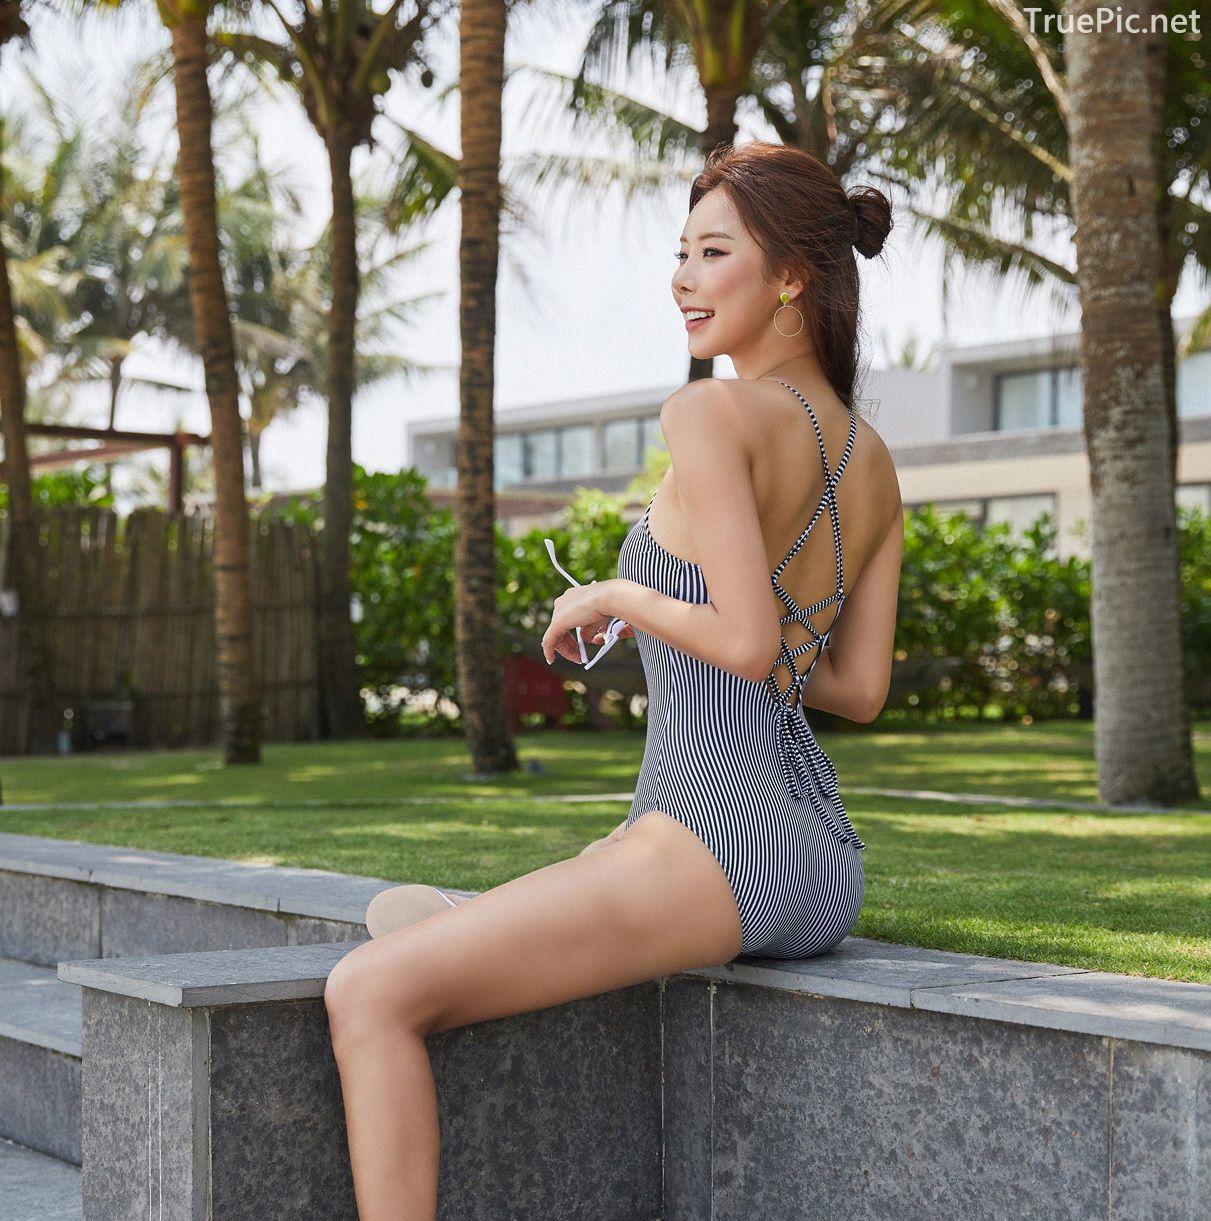 Korean model and fashion - Park Da Hyun - Hightension Swimsuit Set - Picture 6